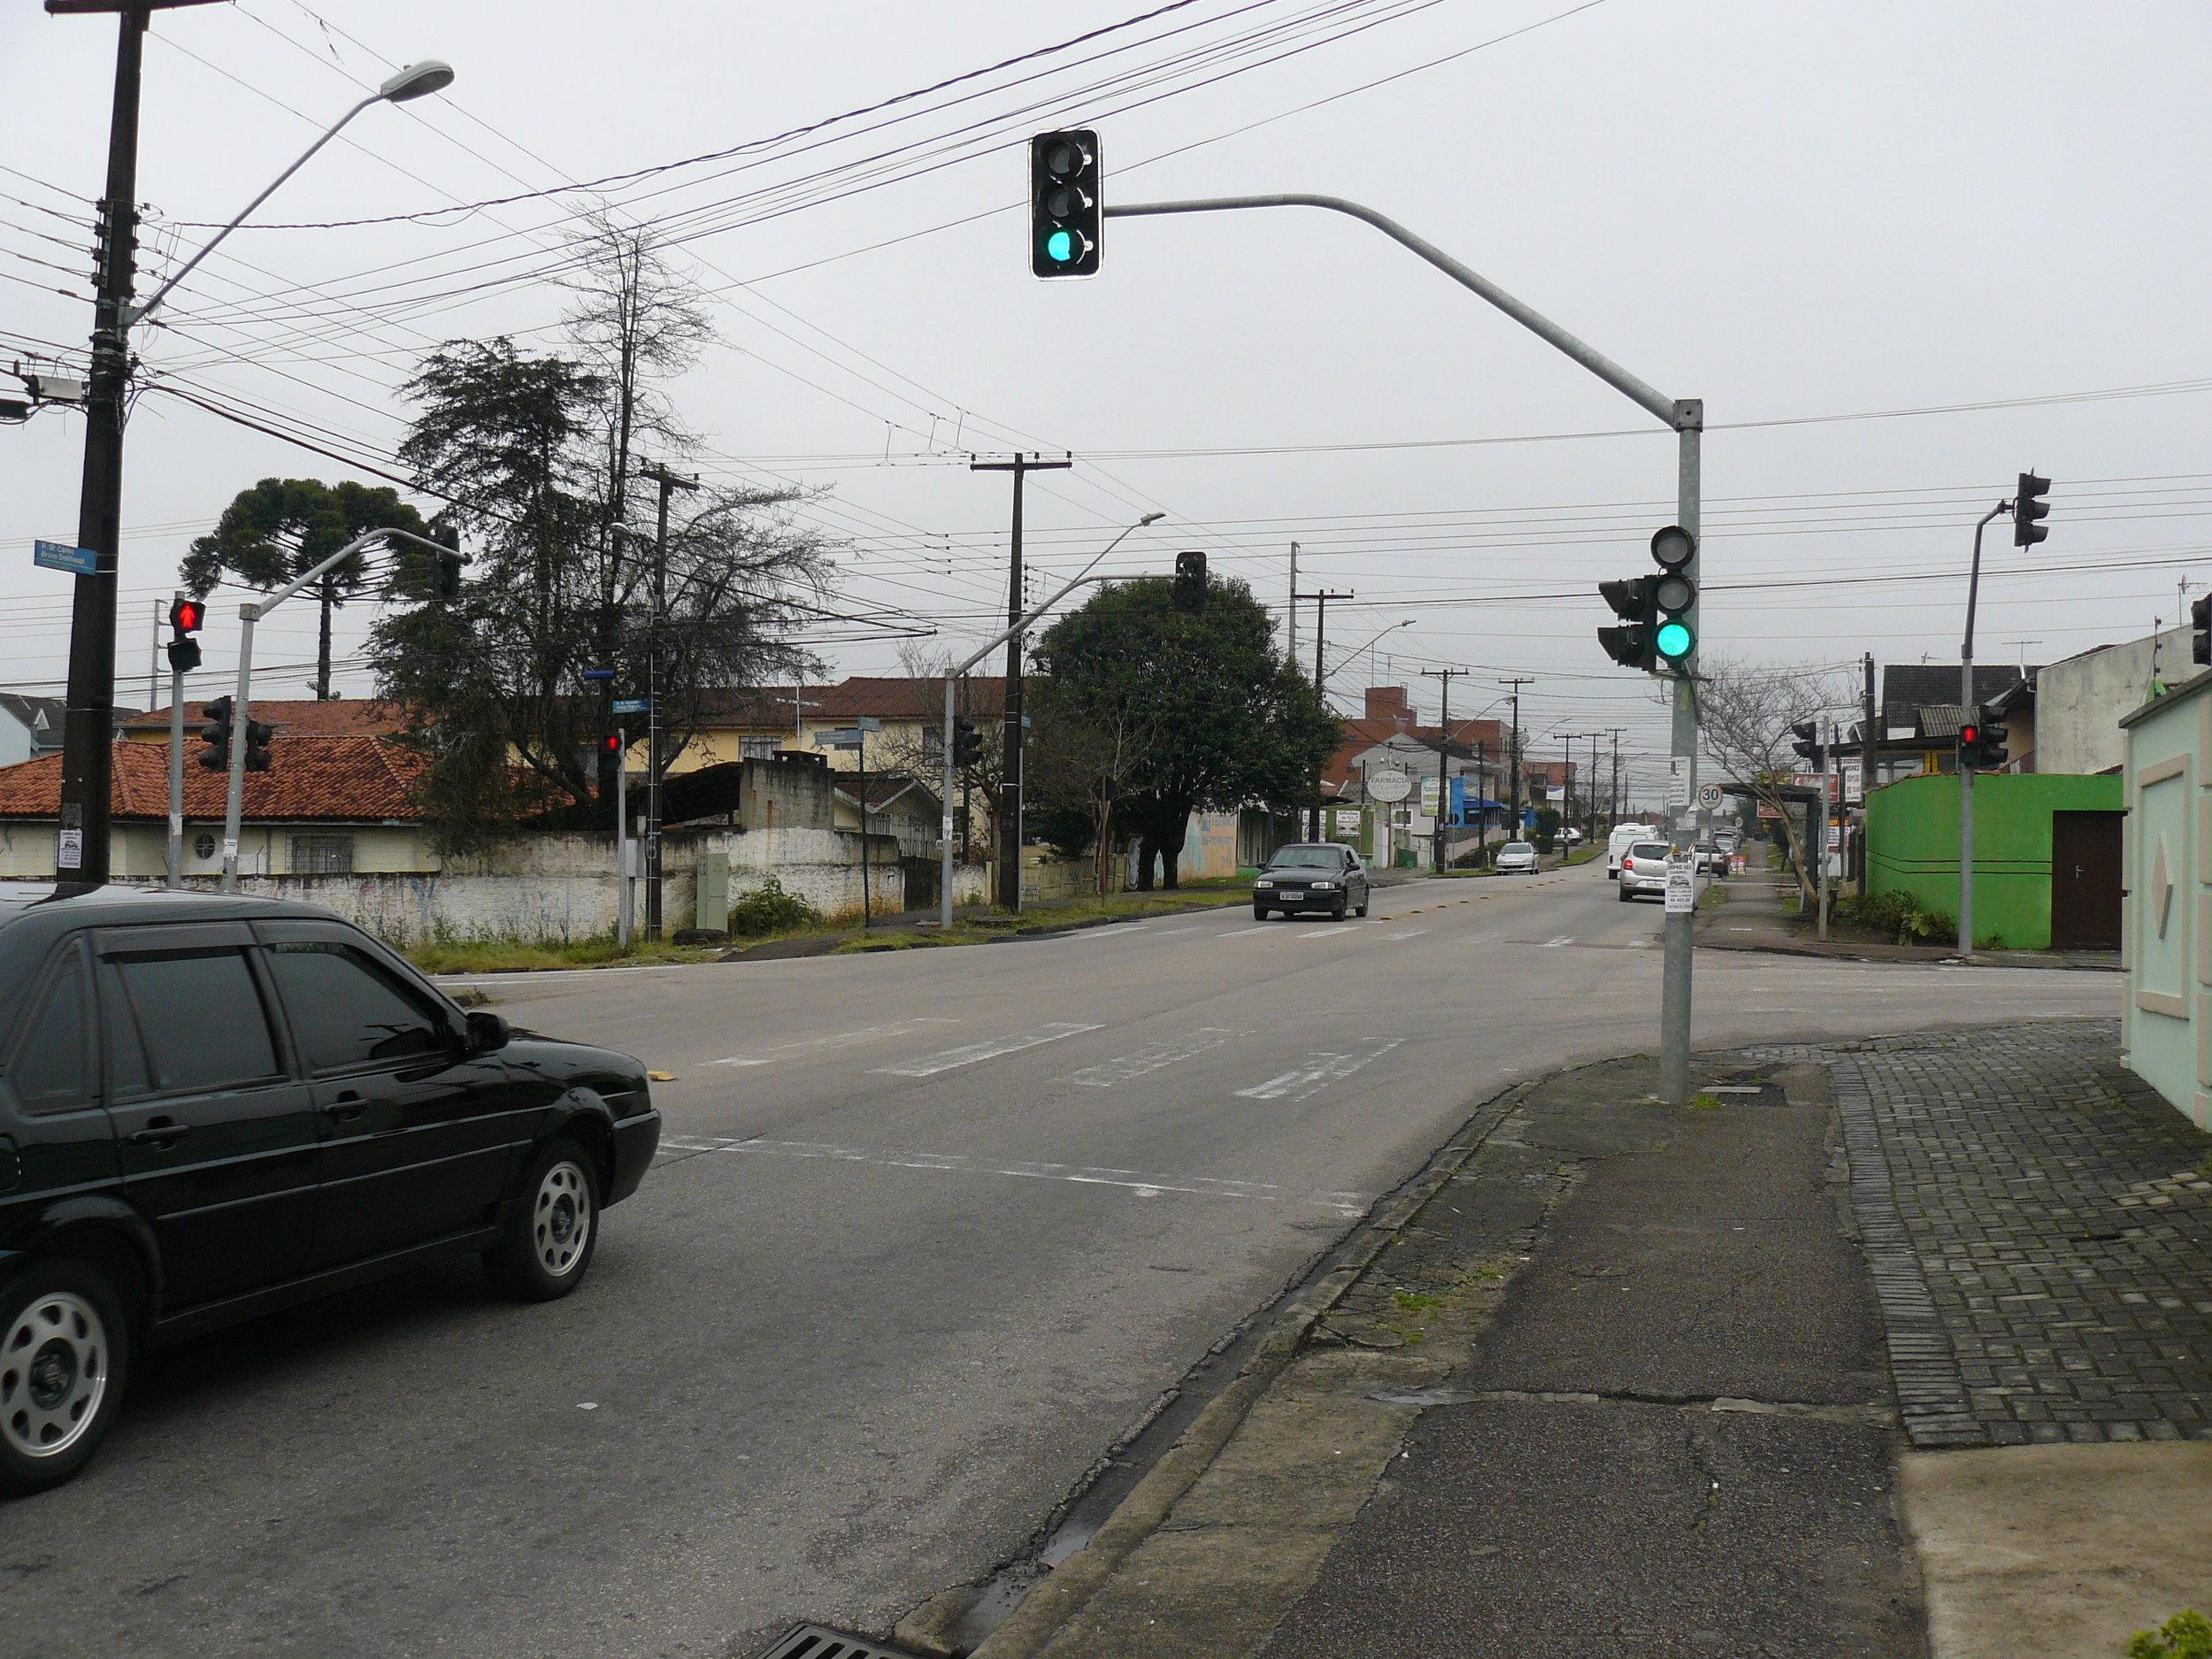 Semáforo na Rua Dr. Bronislau O. Roguski com a Rua Dr. Carlos Bruno Breithaupt